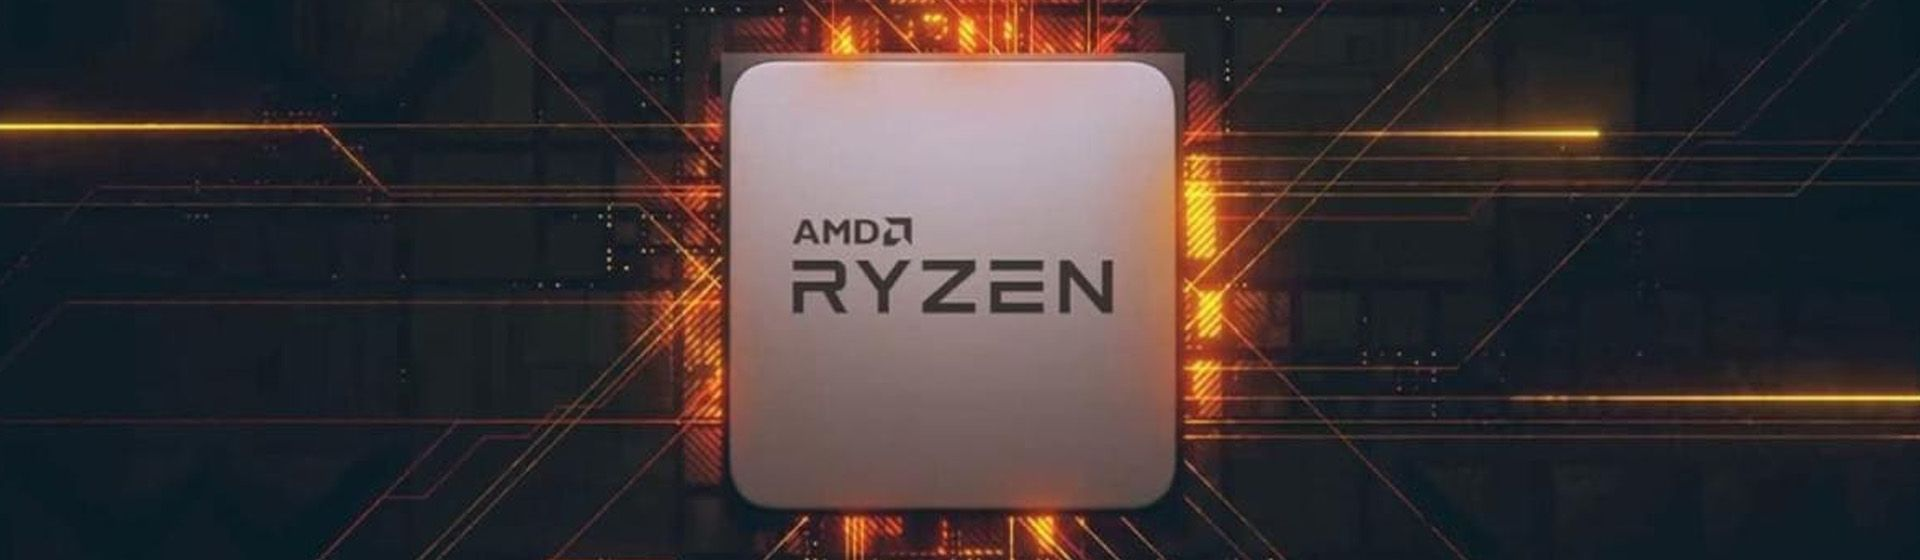 AMD libera detalhes sobre processadores Ryzen 5000 para notebook